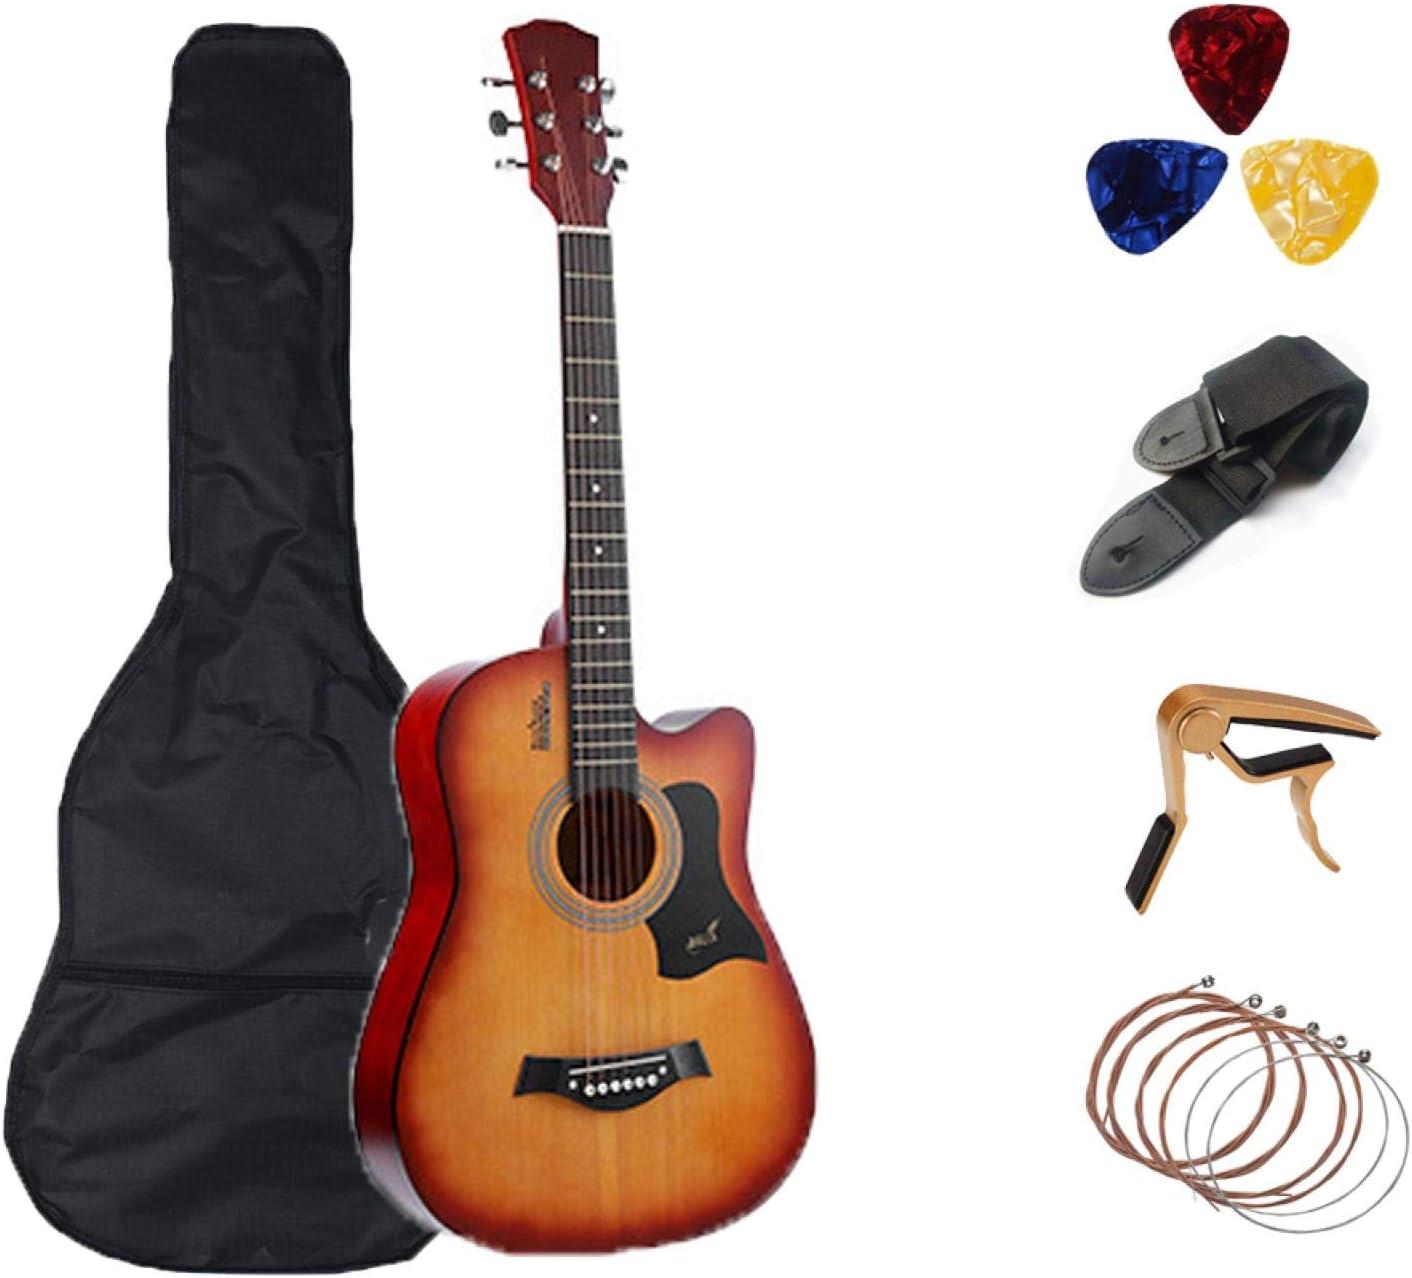 KEPOHK 38/41 pulgadas Guitarra 6 cuerdas Folk Pop Guitarra acústica Guitarra de madera maciza Guitarra profesional Guitarra Enviar accesorios 38 pulgadas SunsetA